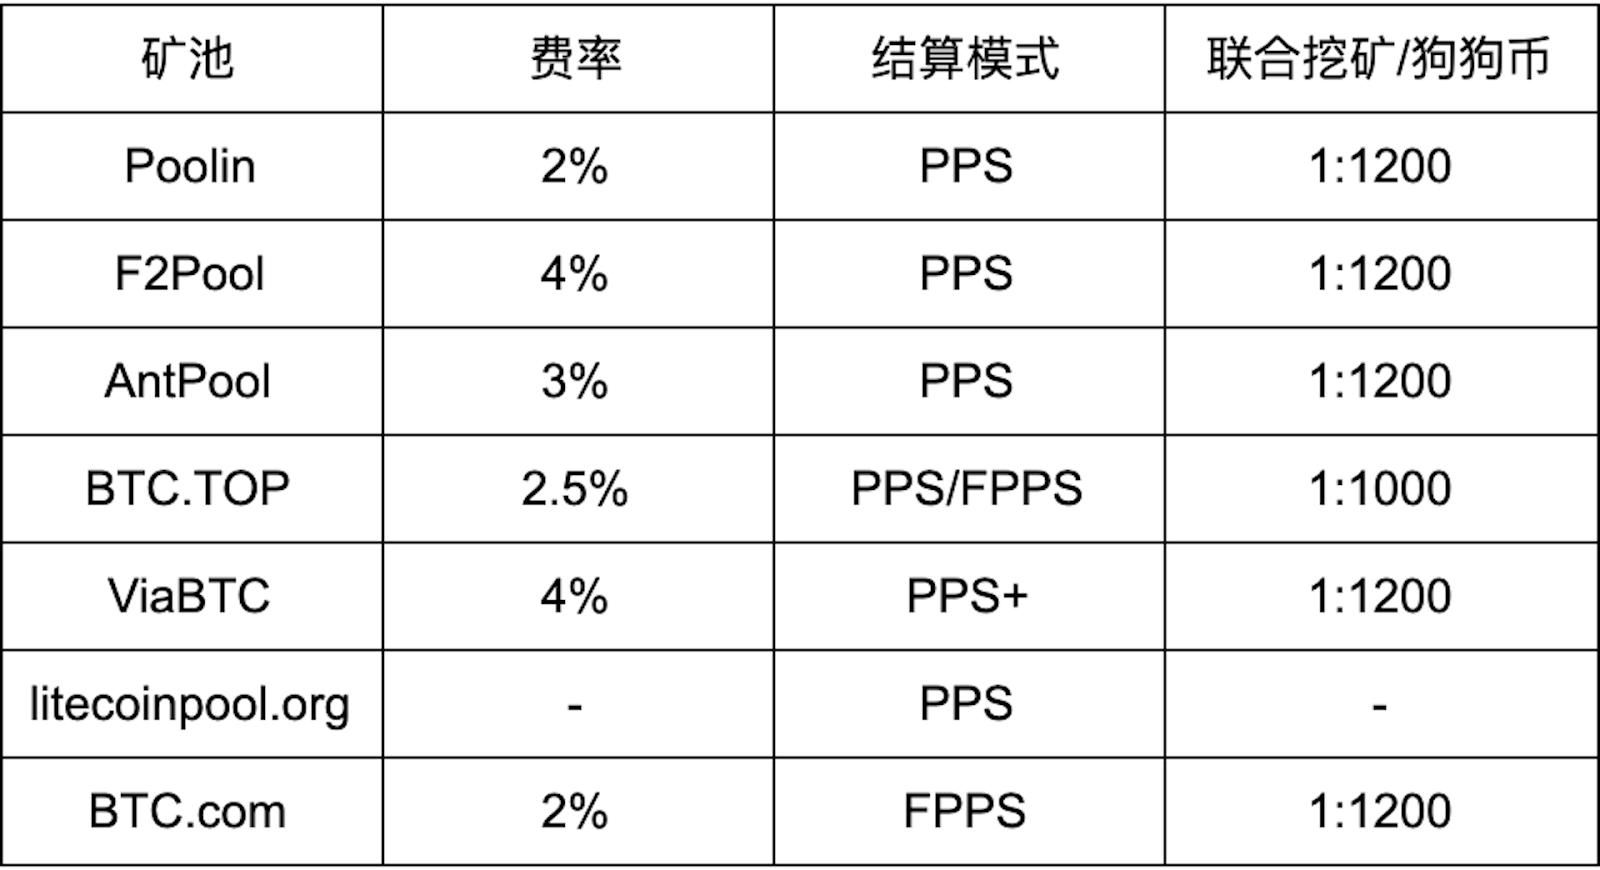 FiOjKFKcHq2 3ZKuLtIJ6EYa4GI9 - 【测评】莱特币矿池测评 | 第一期 | 矿池人性化服务